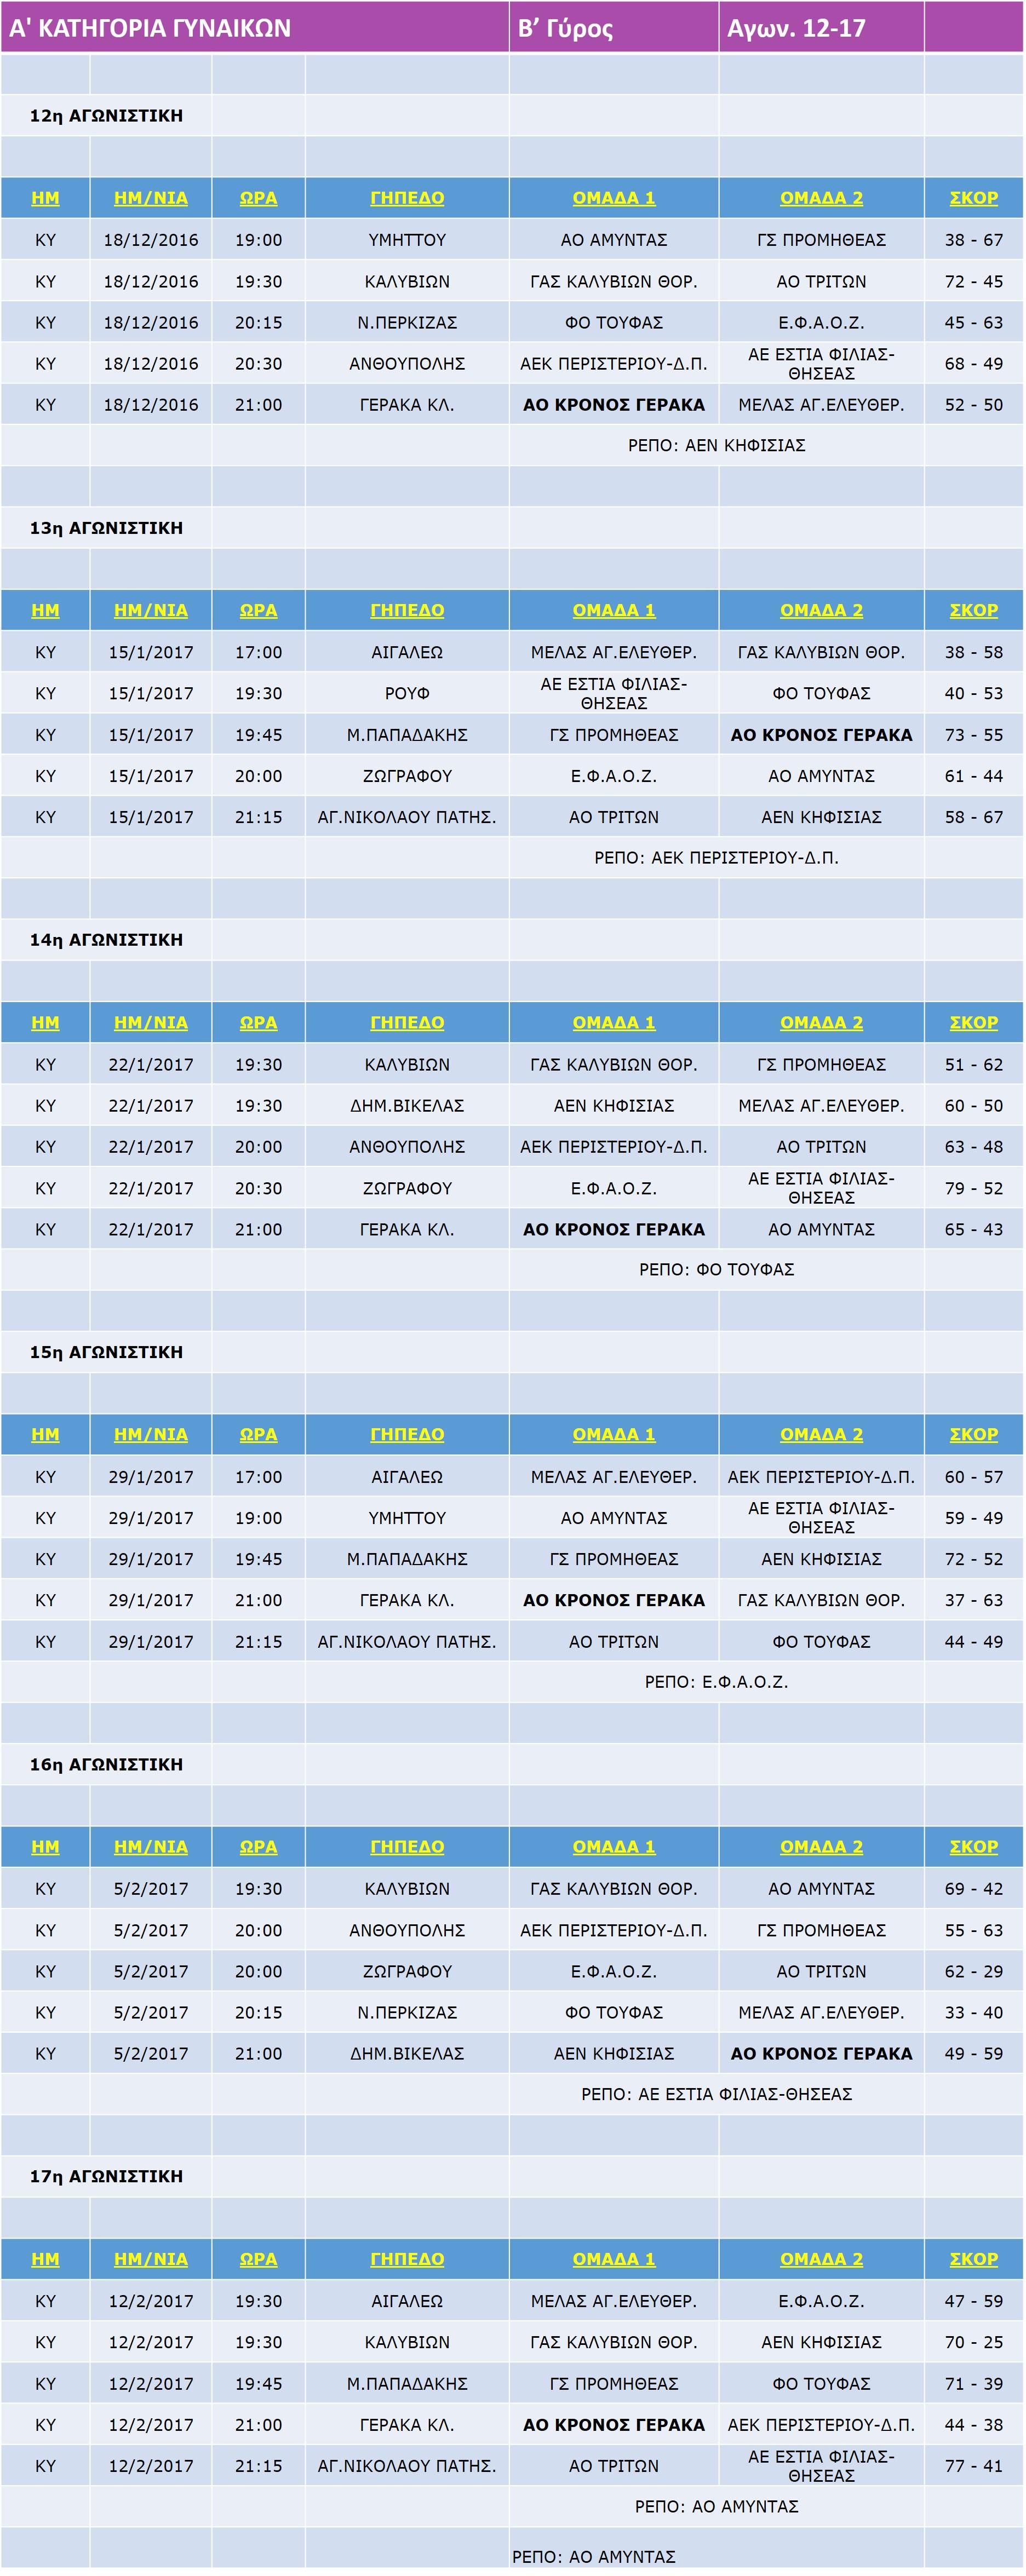 Gynaikes_Match_12-17_17